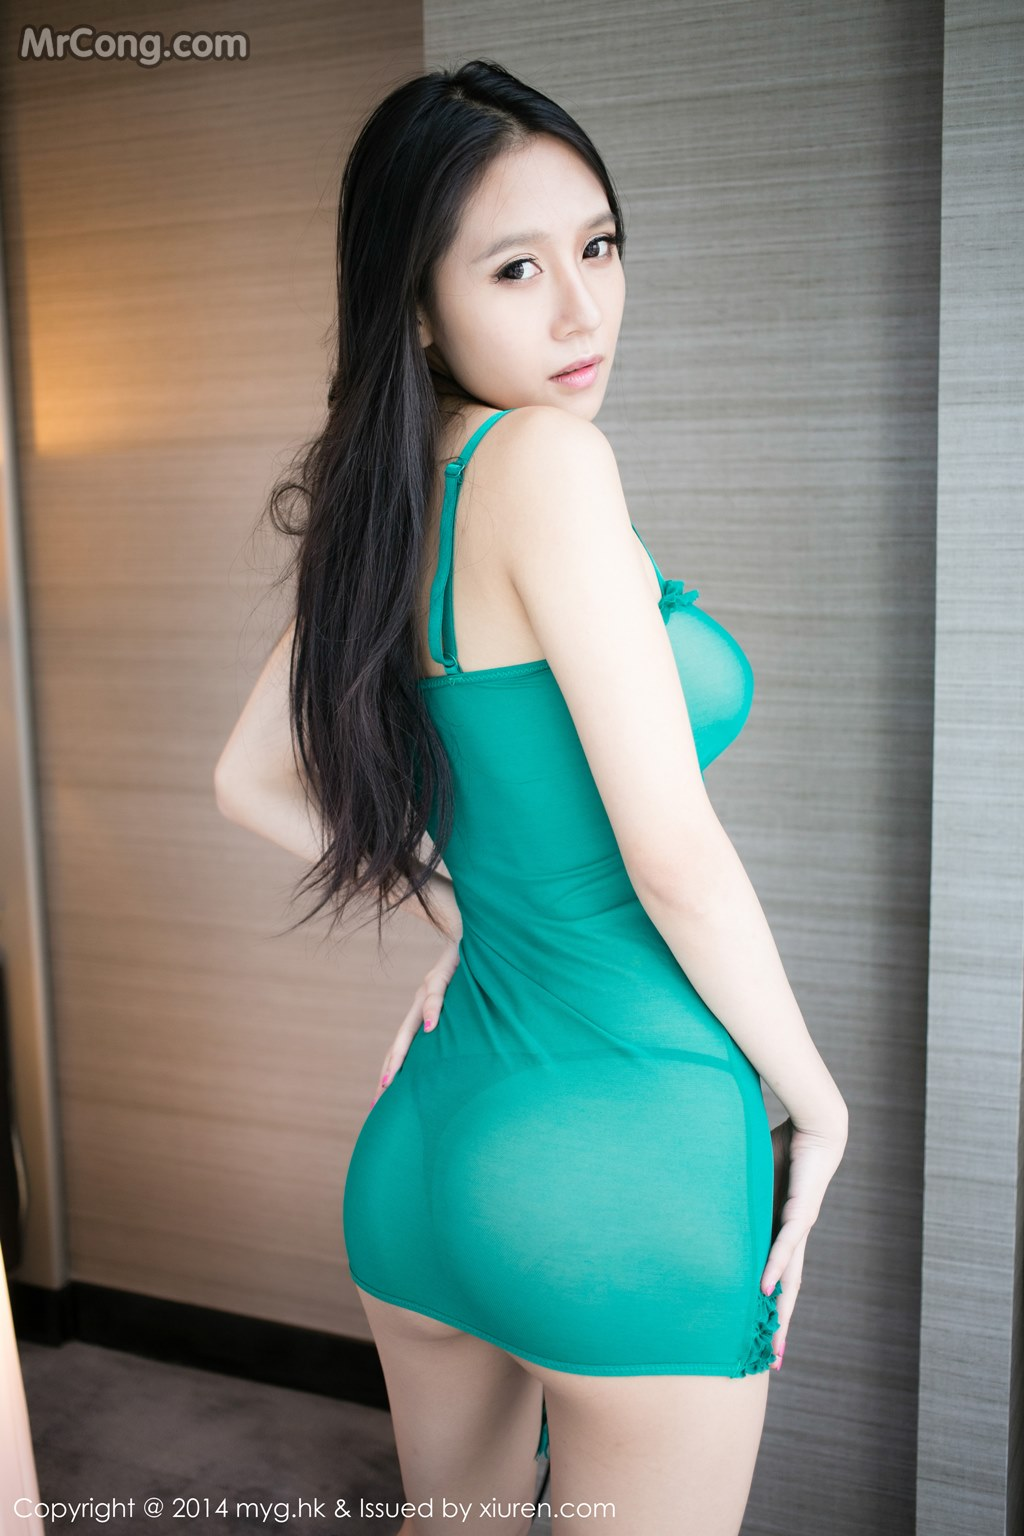 MyGirl Vol.065: Model Yu Da Xiaojie AYU (于大小姐AYU) (50P)